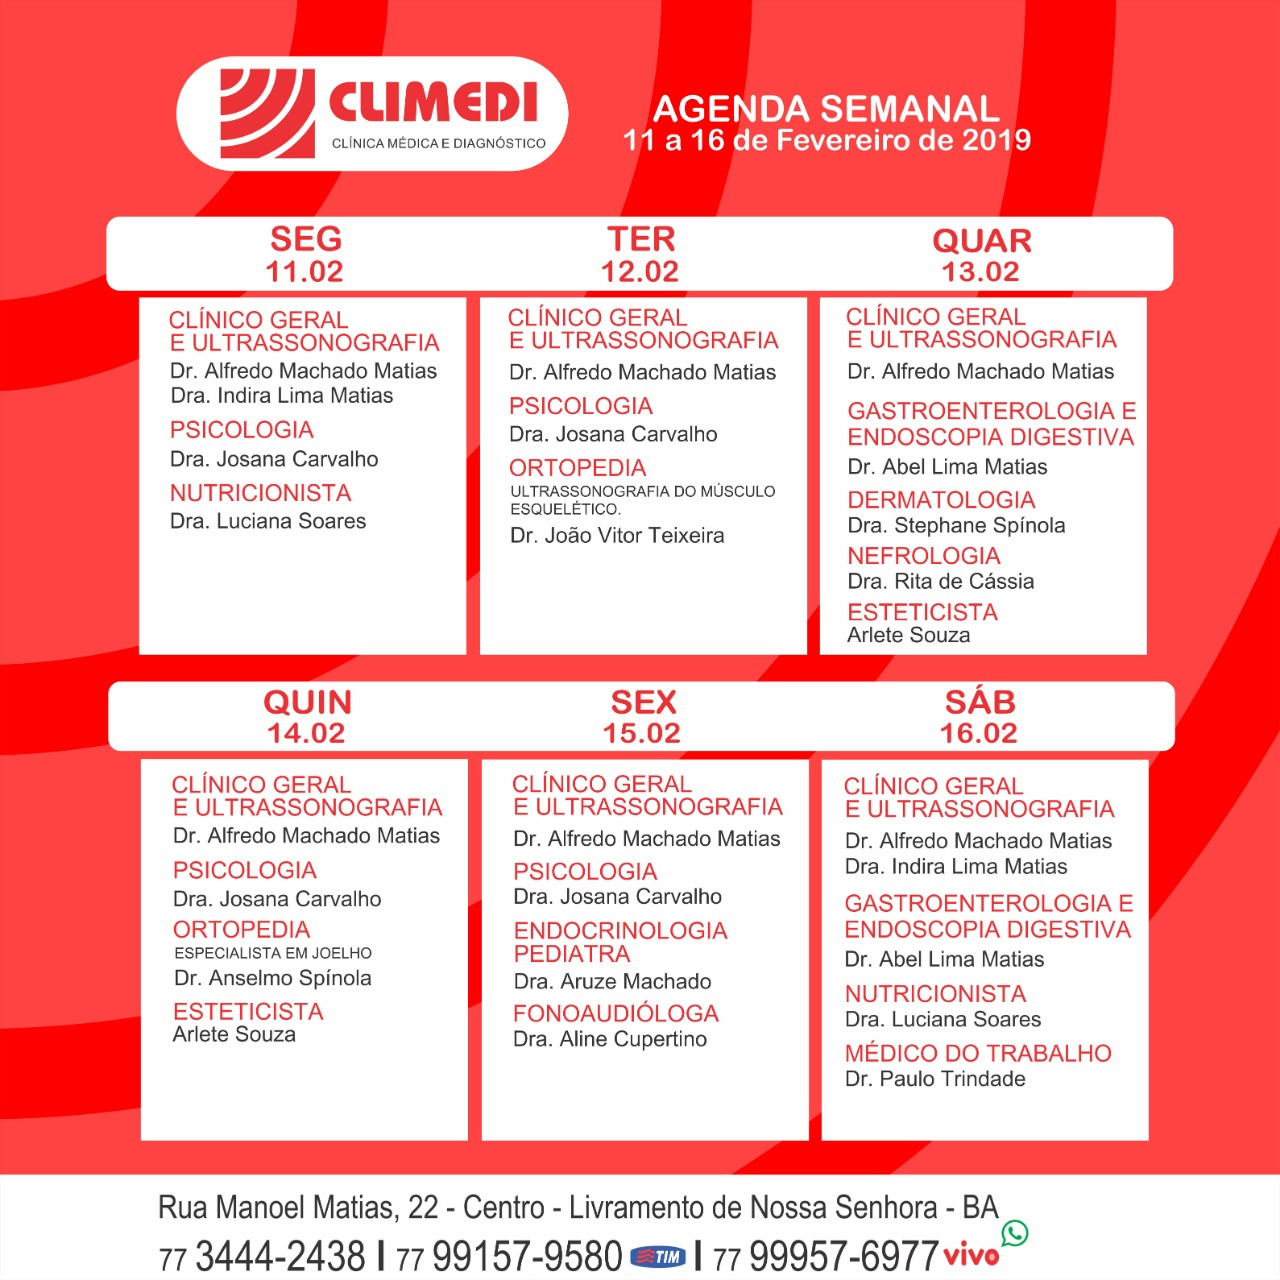 Livramento: Confira agenda semanal da CLIMEDI